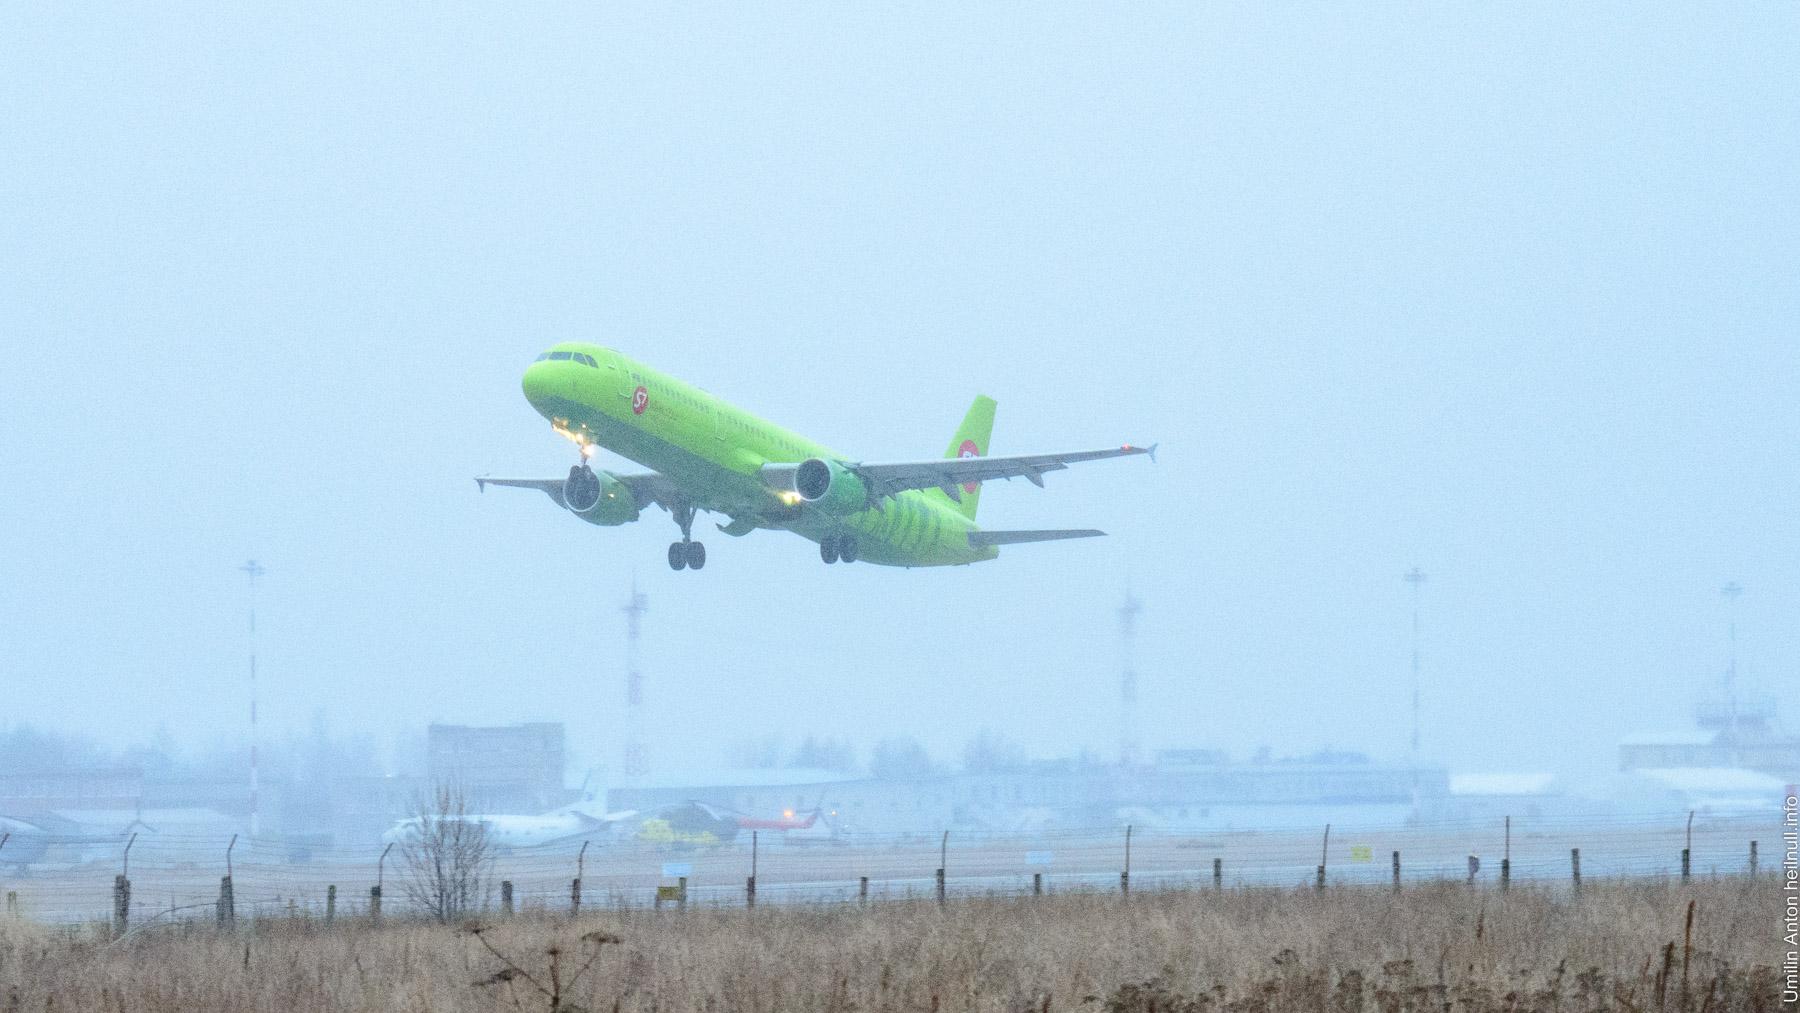 UAY_4608-10